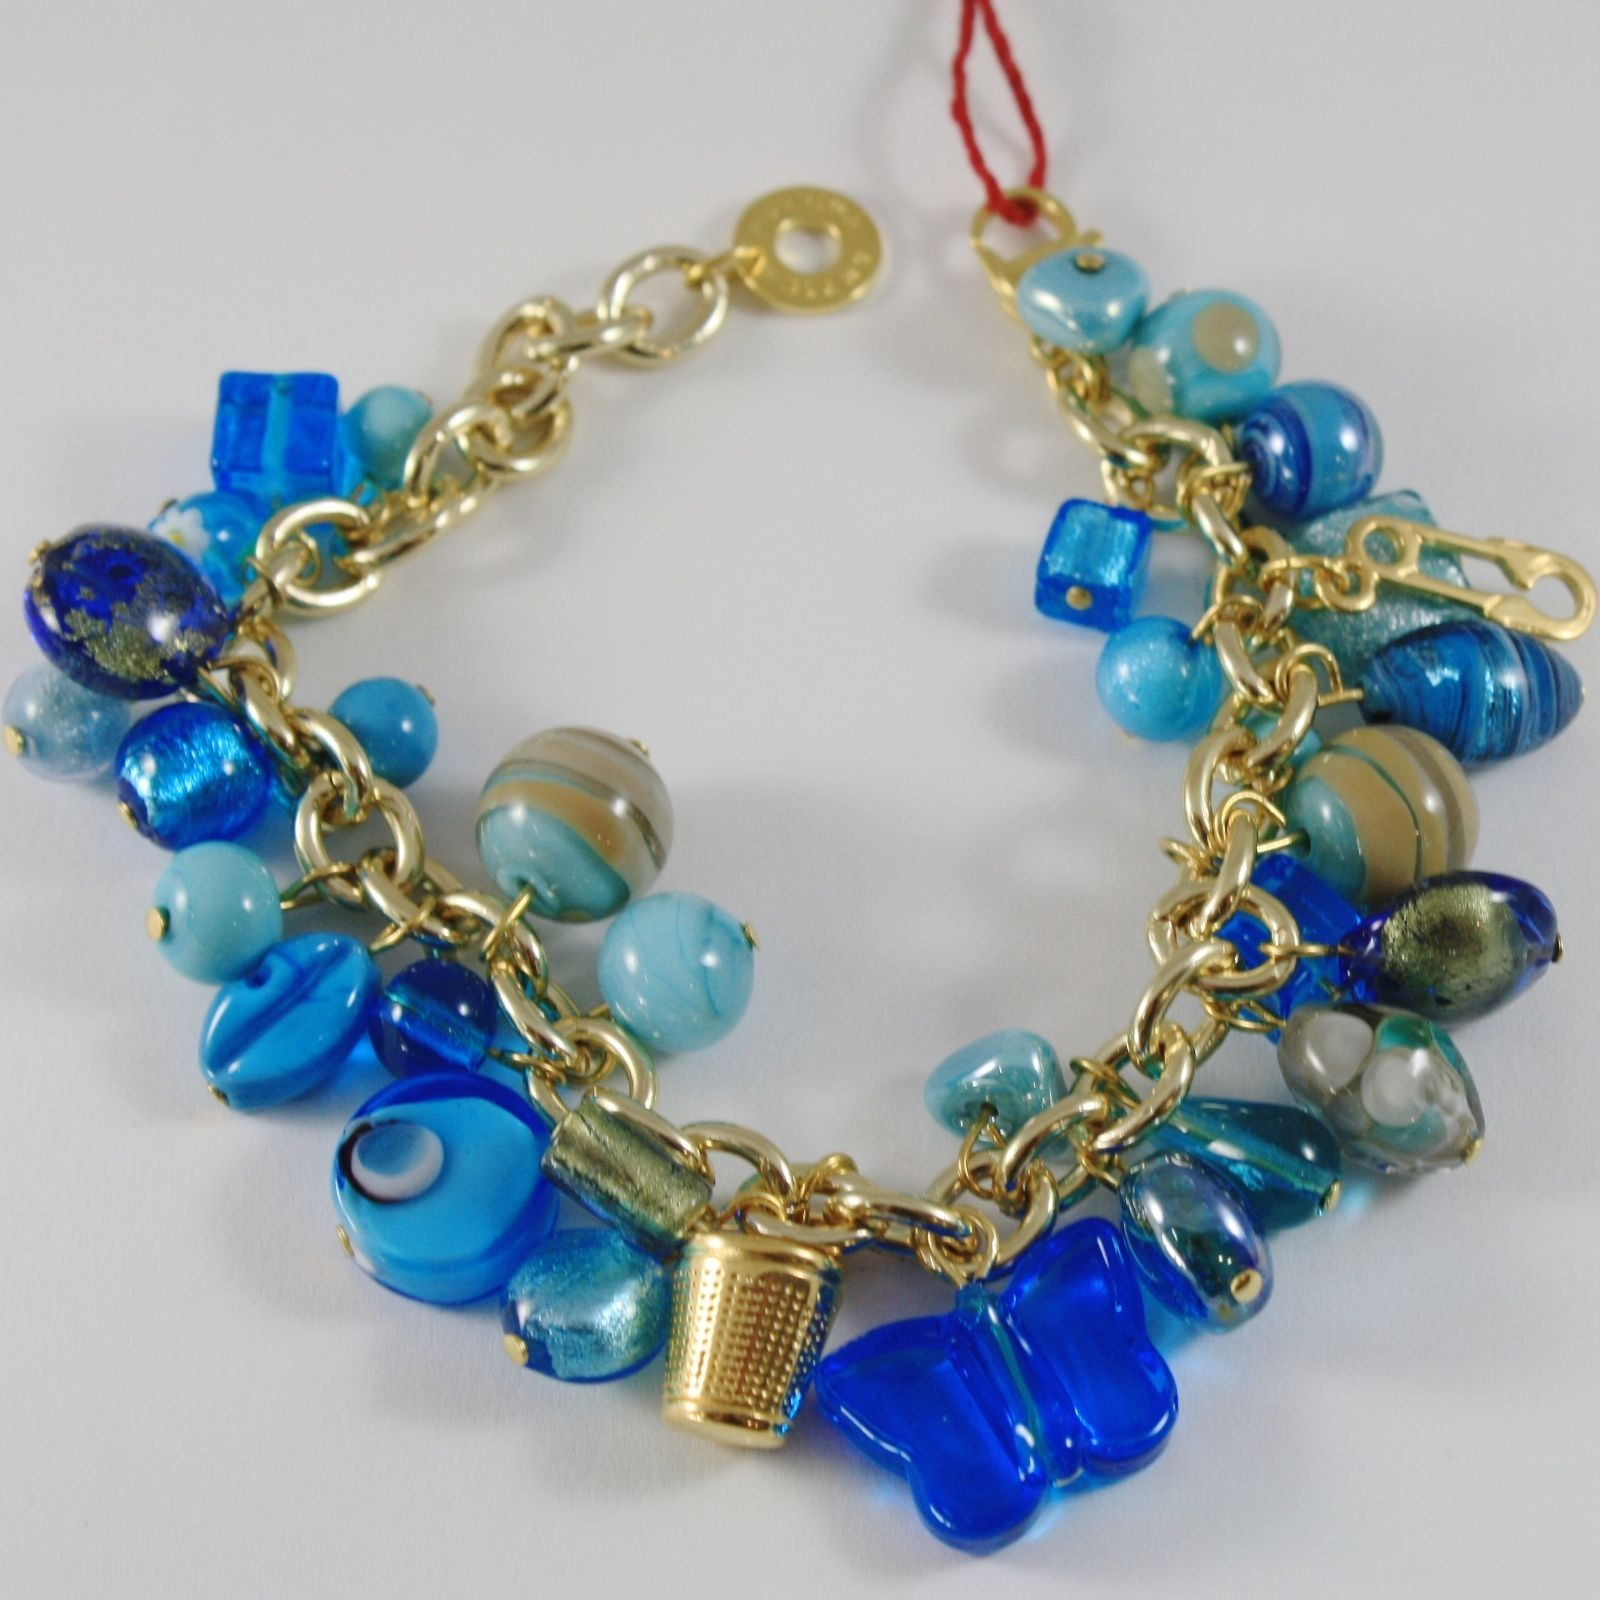 ANTICA MURRINA VENEZIA YELLOW BRACELET BLUE TURQUOISE PENDANTS CHARMS